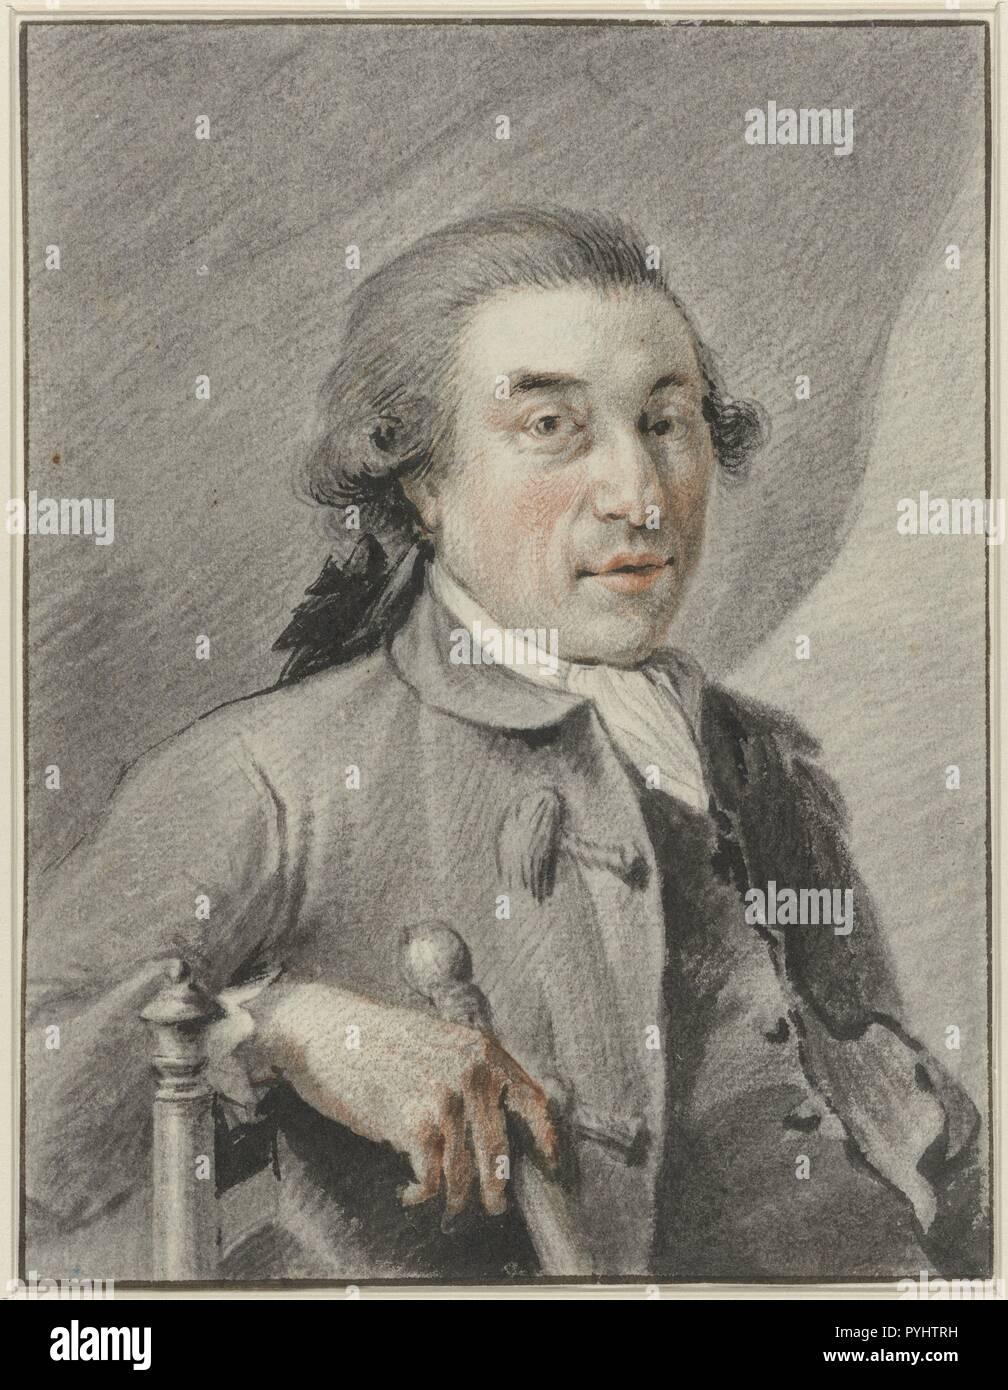 Portret van de schilder Gerrit Toorenburgh, Wybrand Hendriks, 1754 - 1831.jpg - PYHTRH Stock Photo